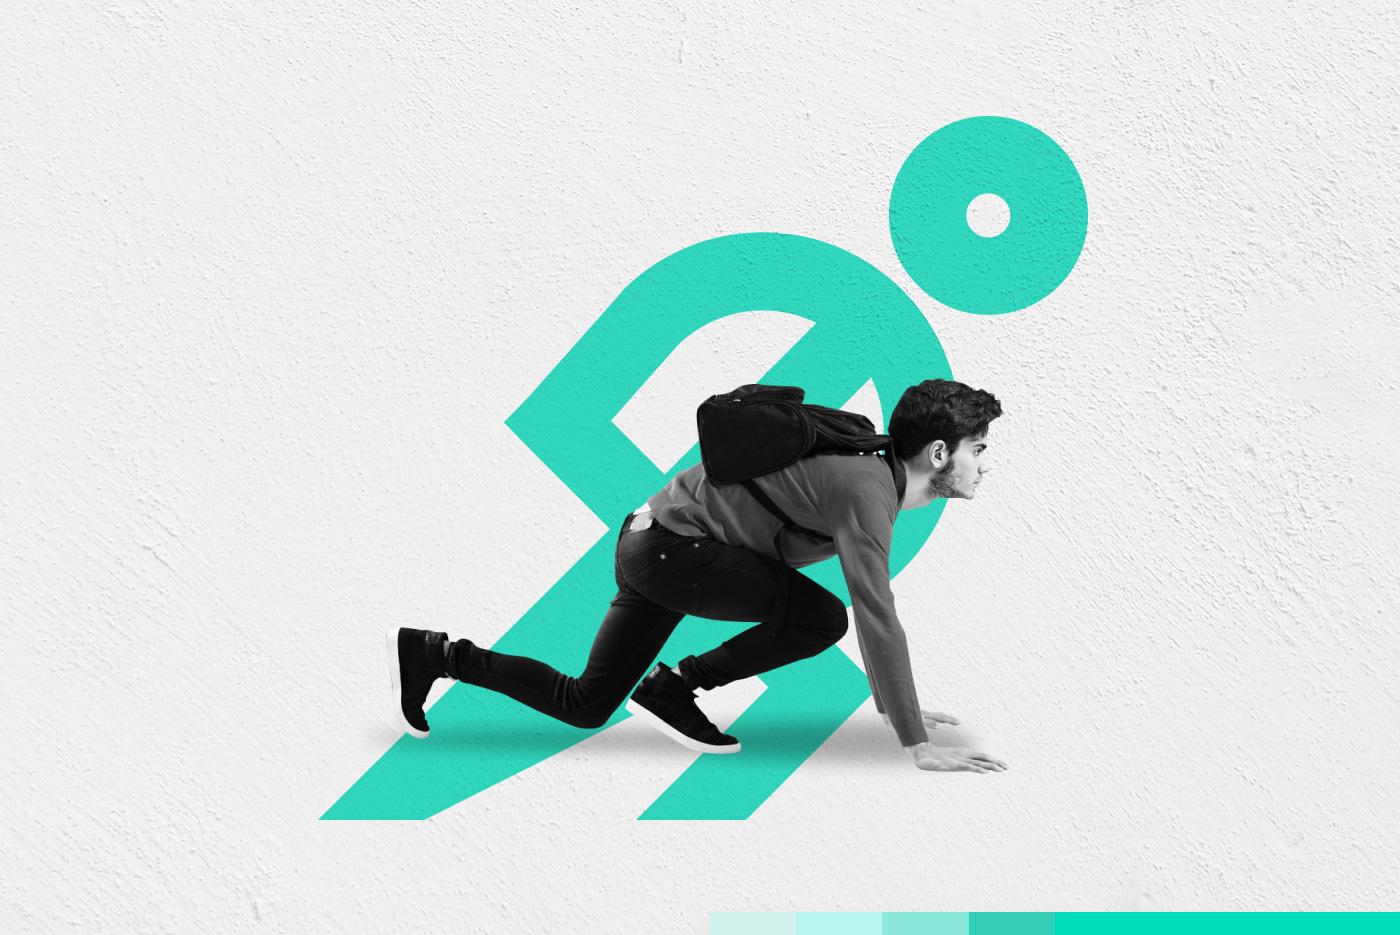 goldenratio identidade Illustrator Logotipo photoshop Proporção visual